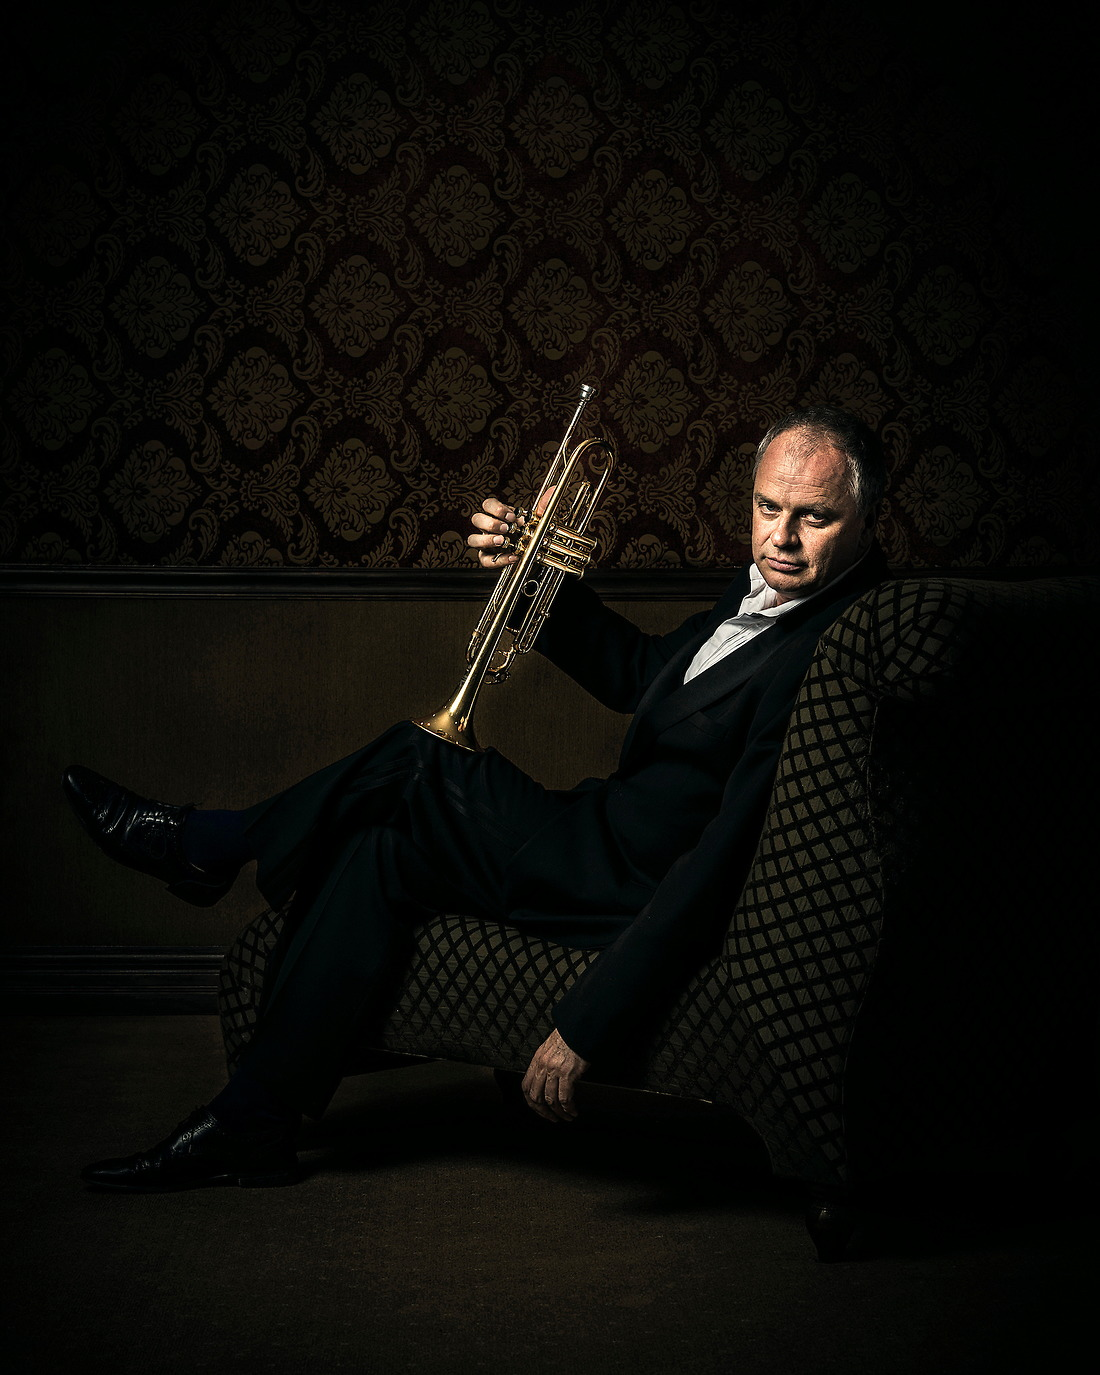 Jens Lindemann International Trumpet Soloist / Clinician and former member of Canadian Brass. — © Jeremy Lock/